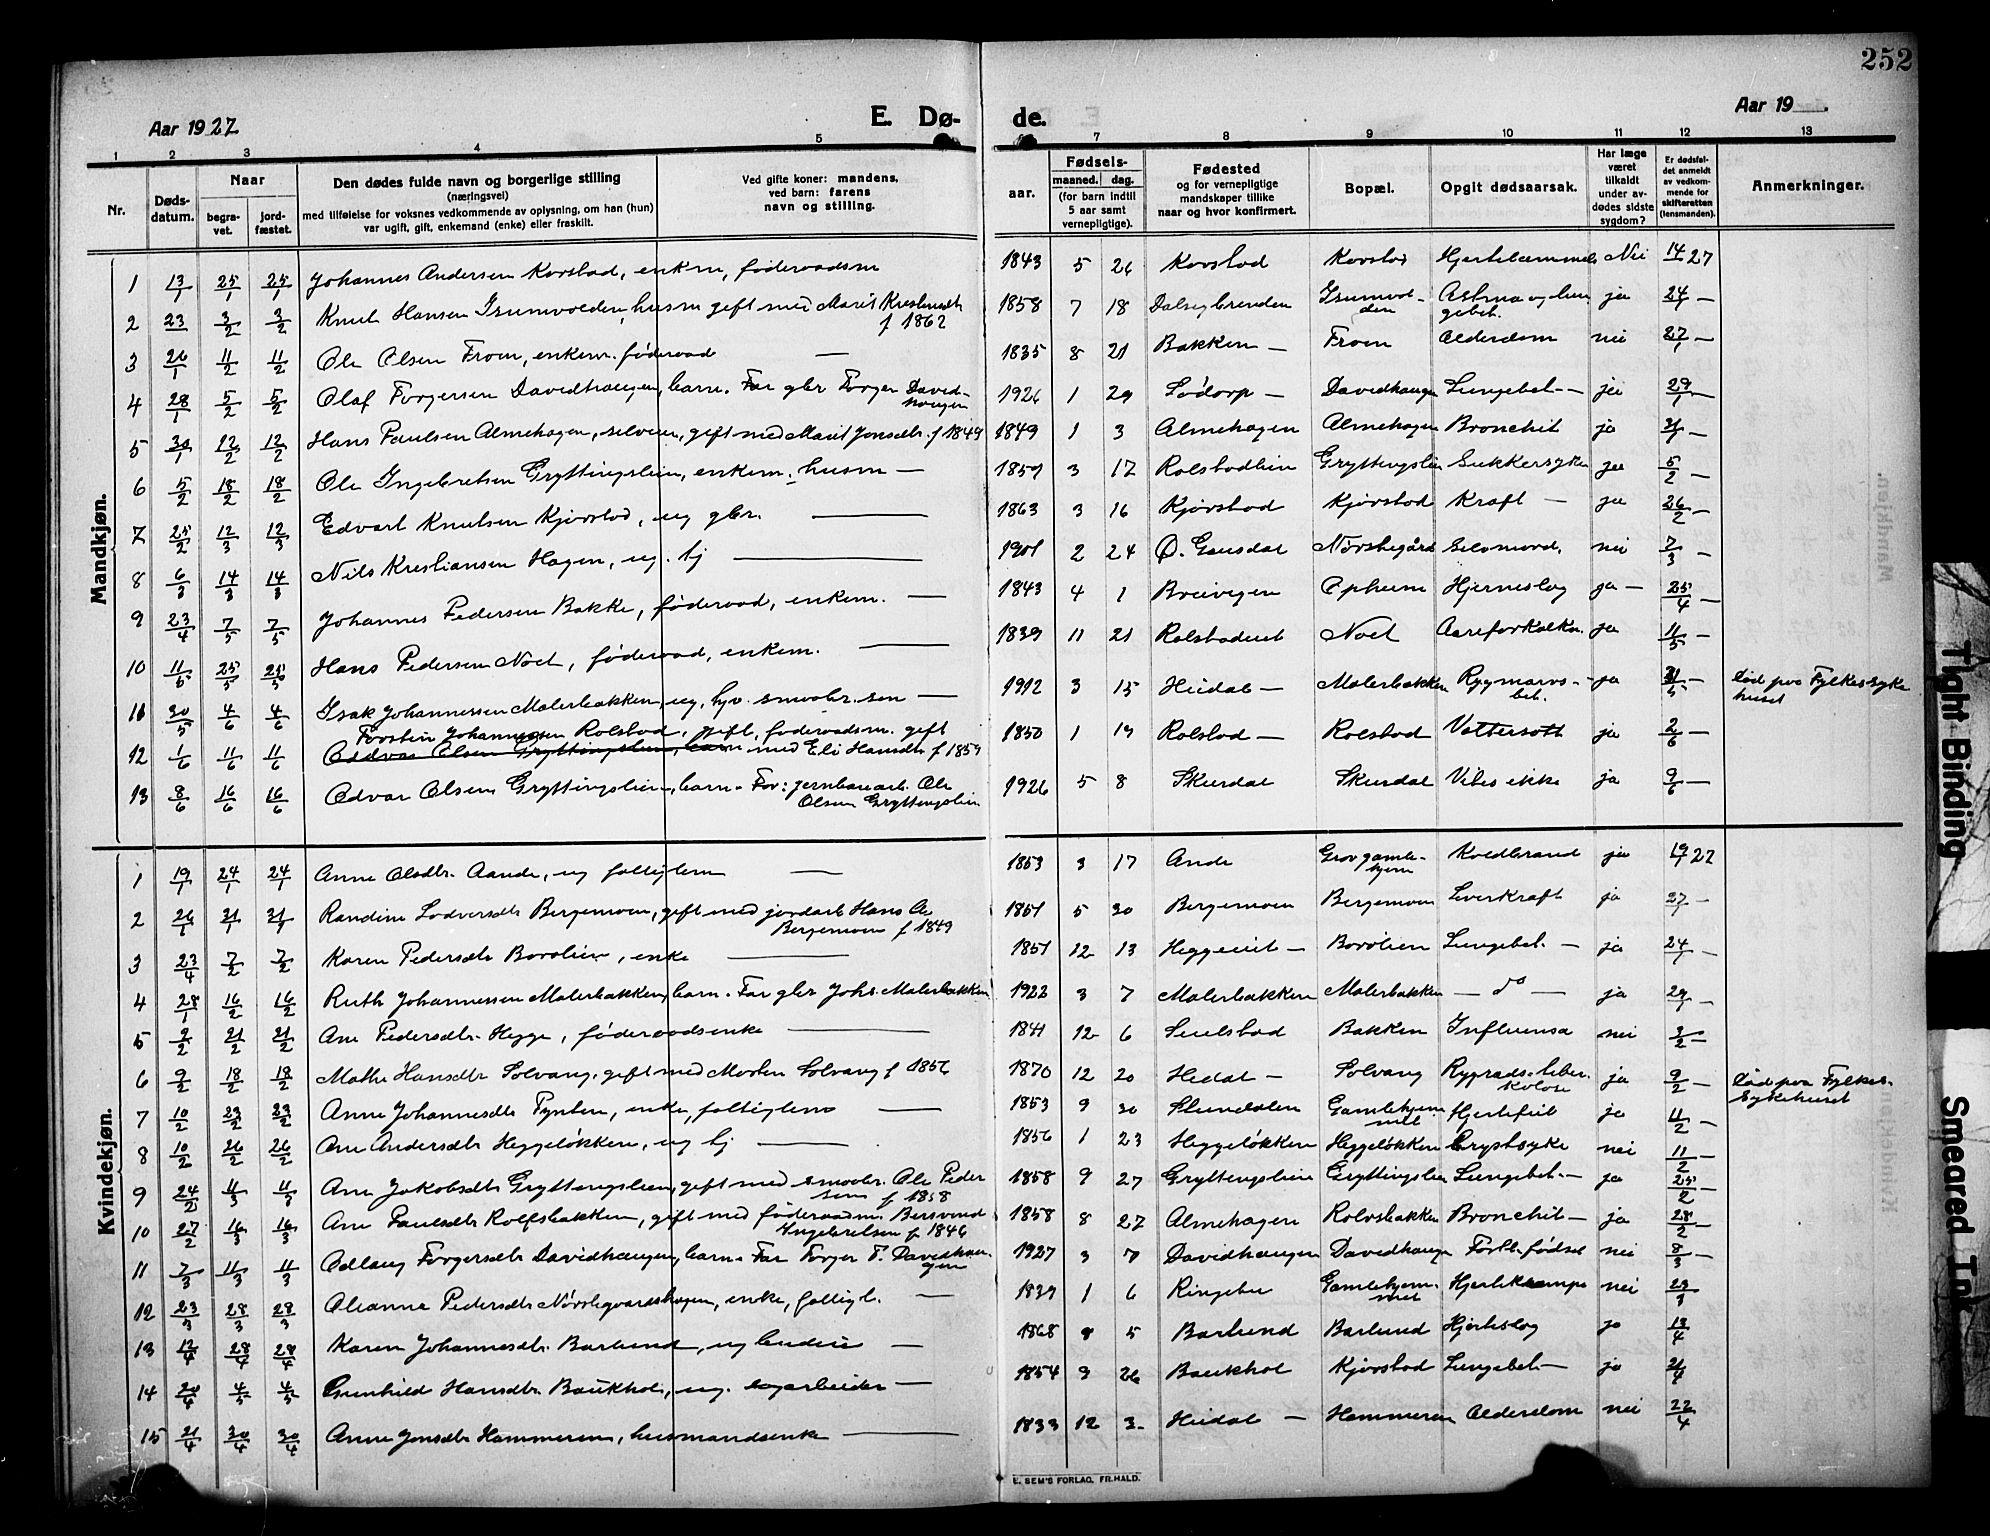 SAH, Sør-Fron prestekontor, H/Ha/Hab/L0005: Klokkerbok nr. 5, 1912-1930, s. 252